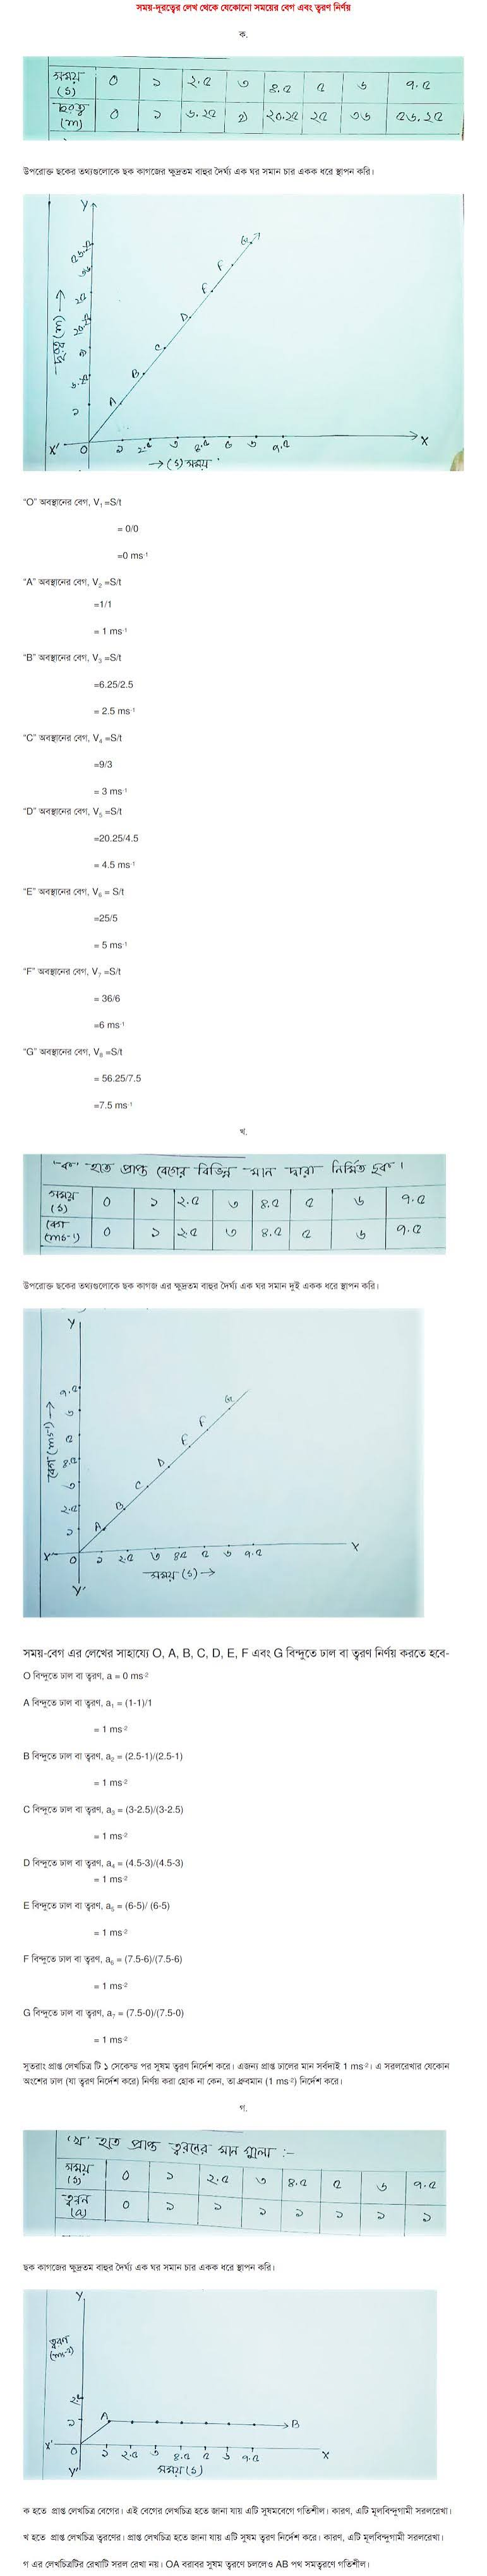 SSC Physics Assignment Answer 2022 3rd Week